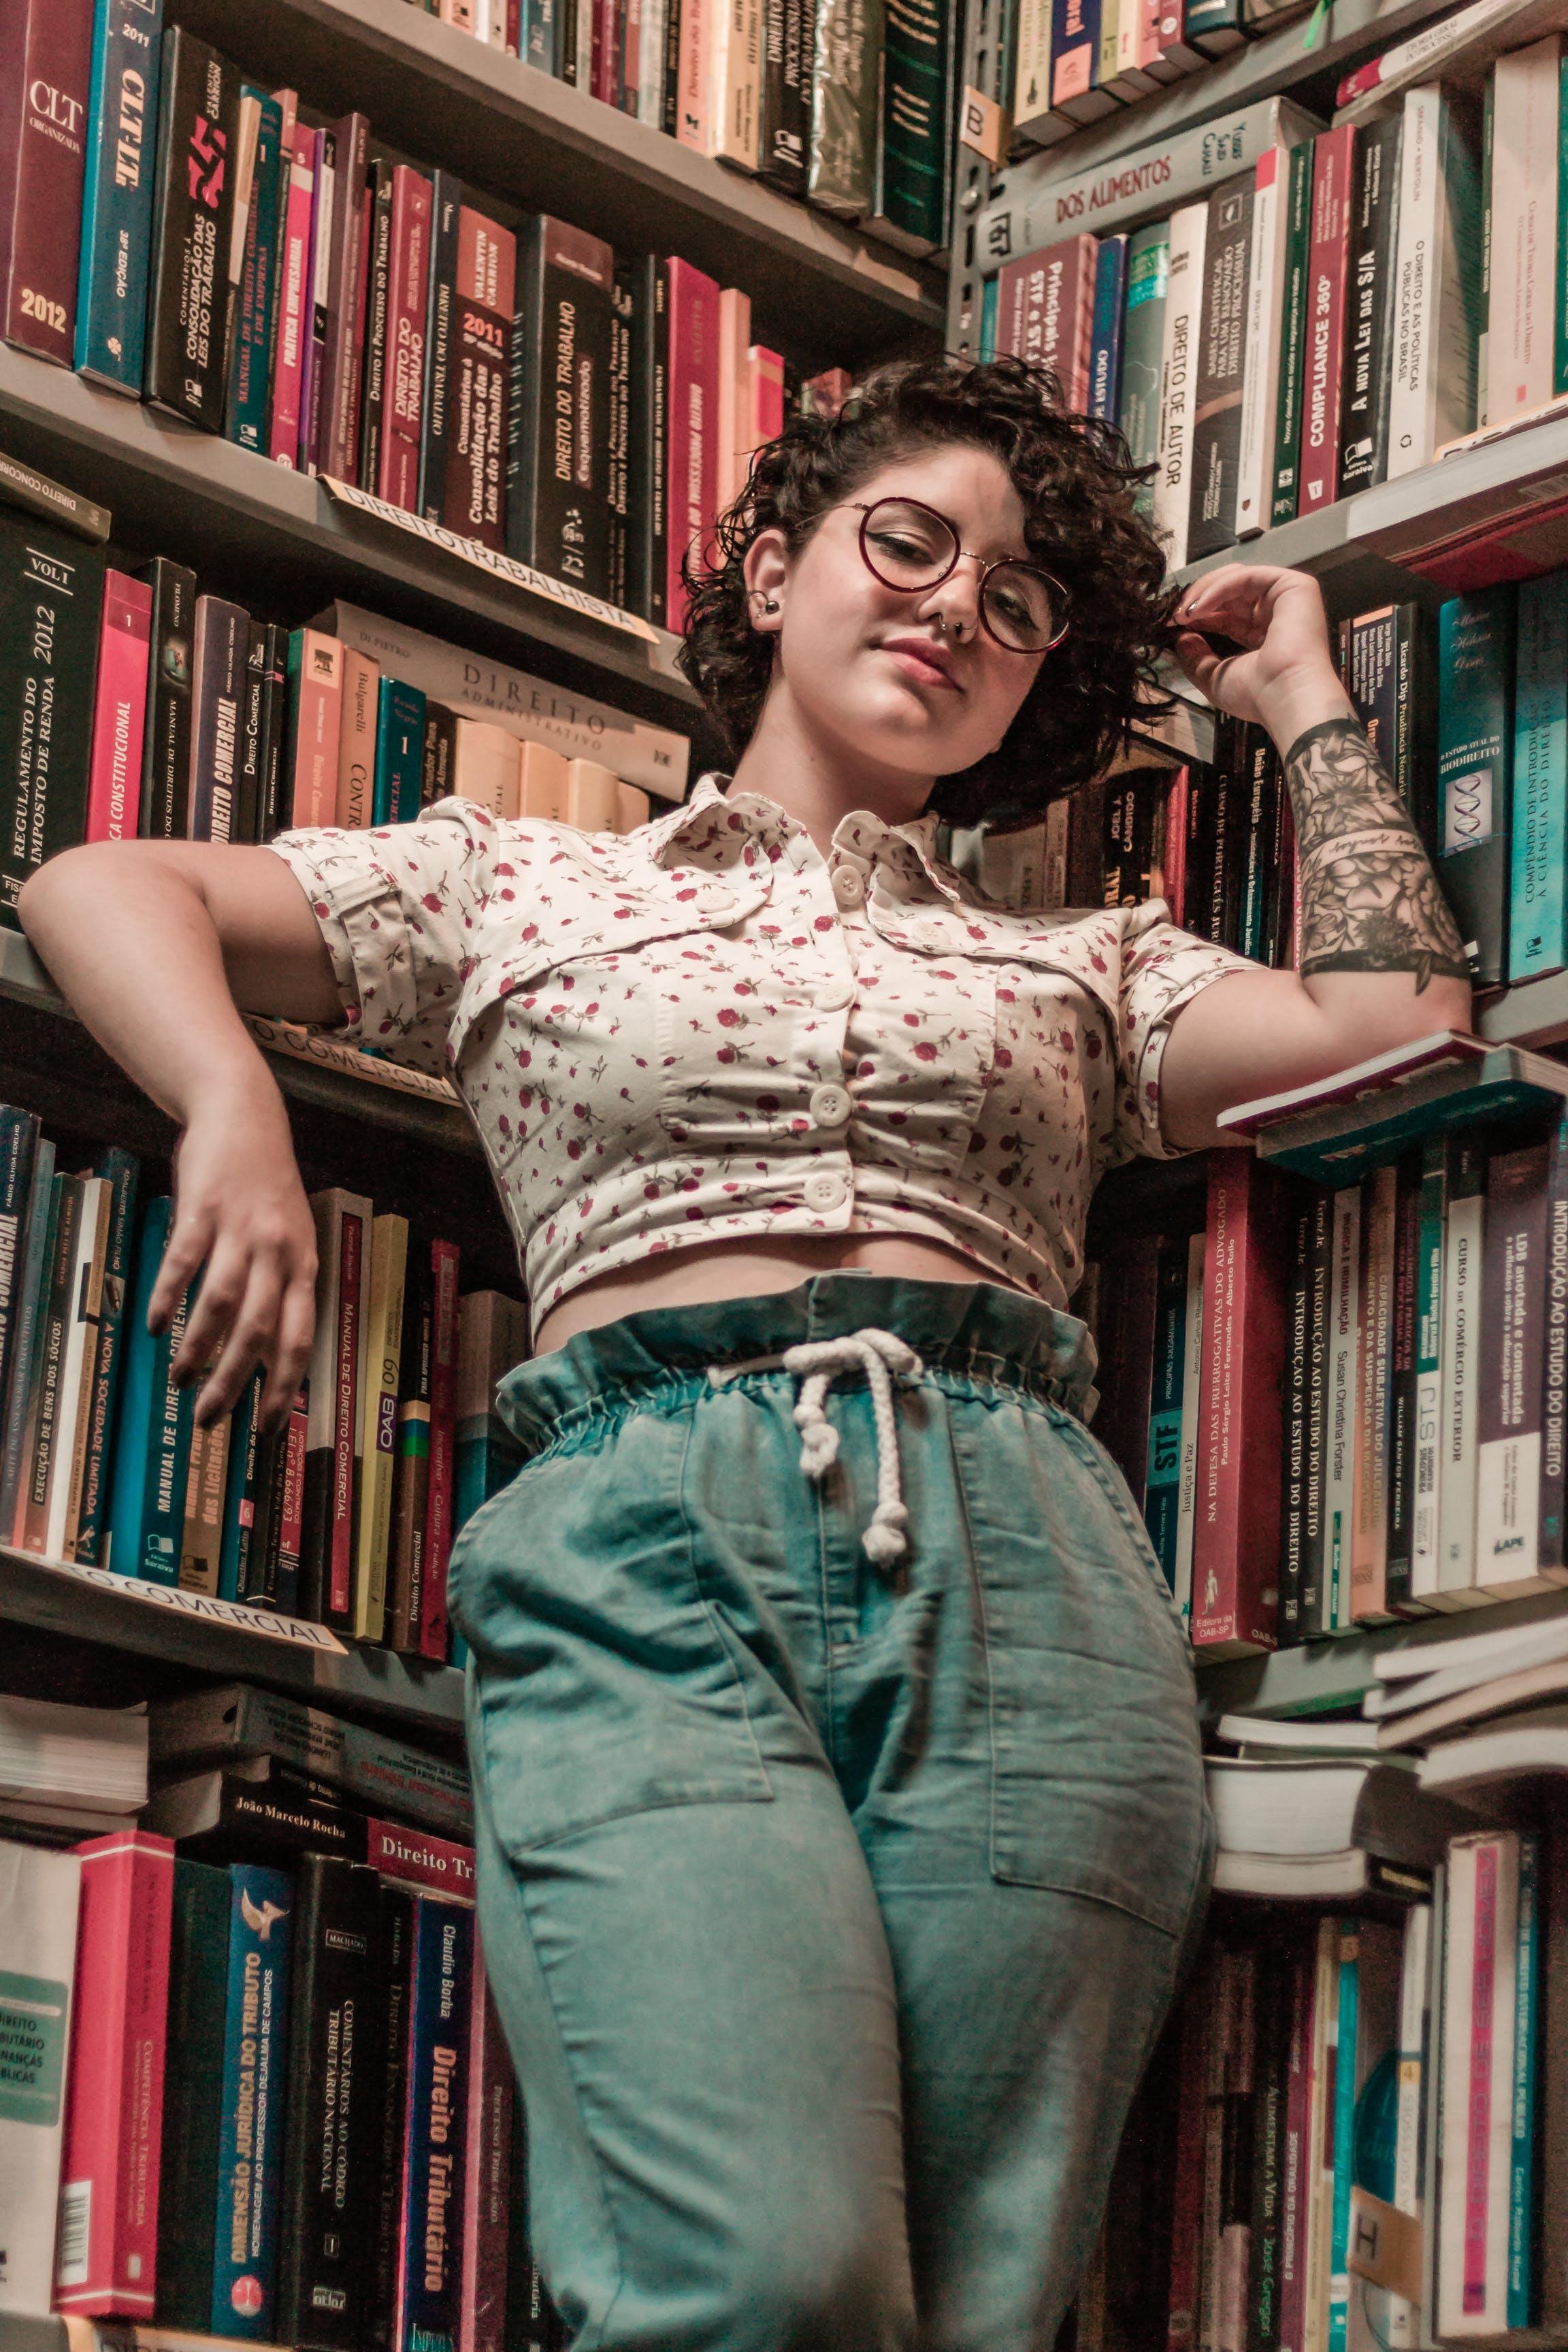 Woman Leaning on Bookshelf